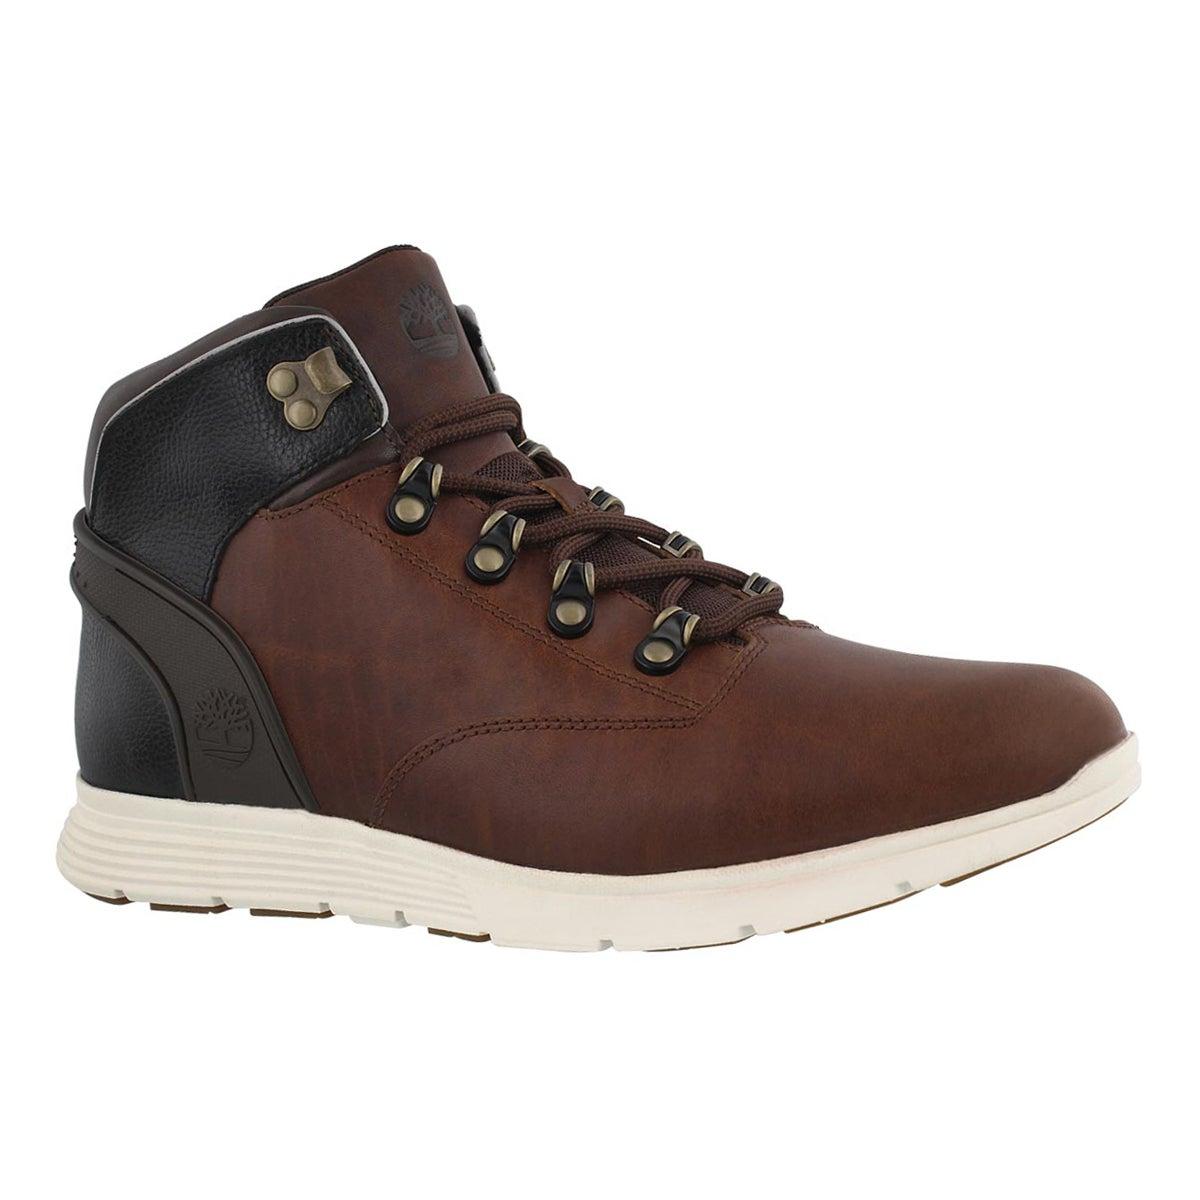 Men's KILLINGTON brown hiking ankle boots